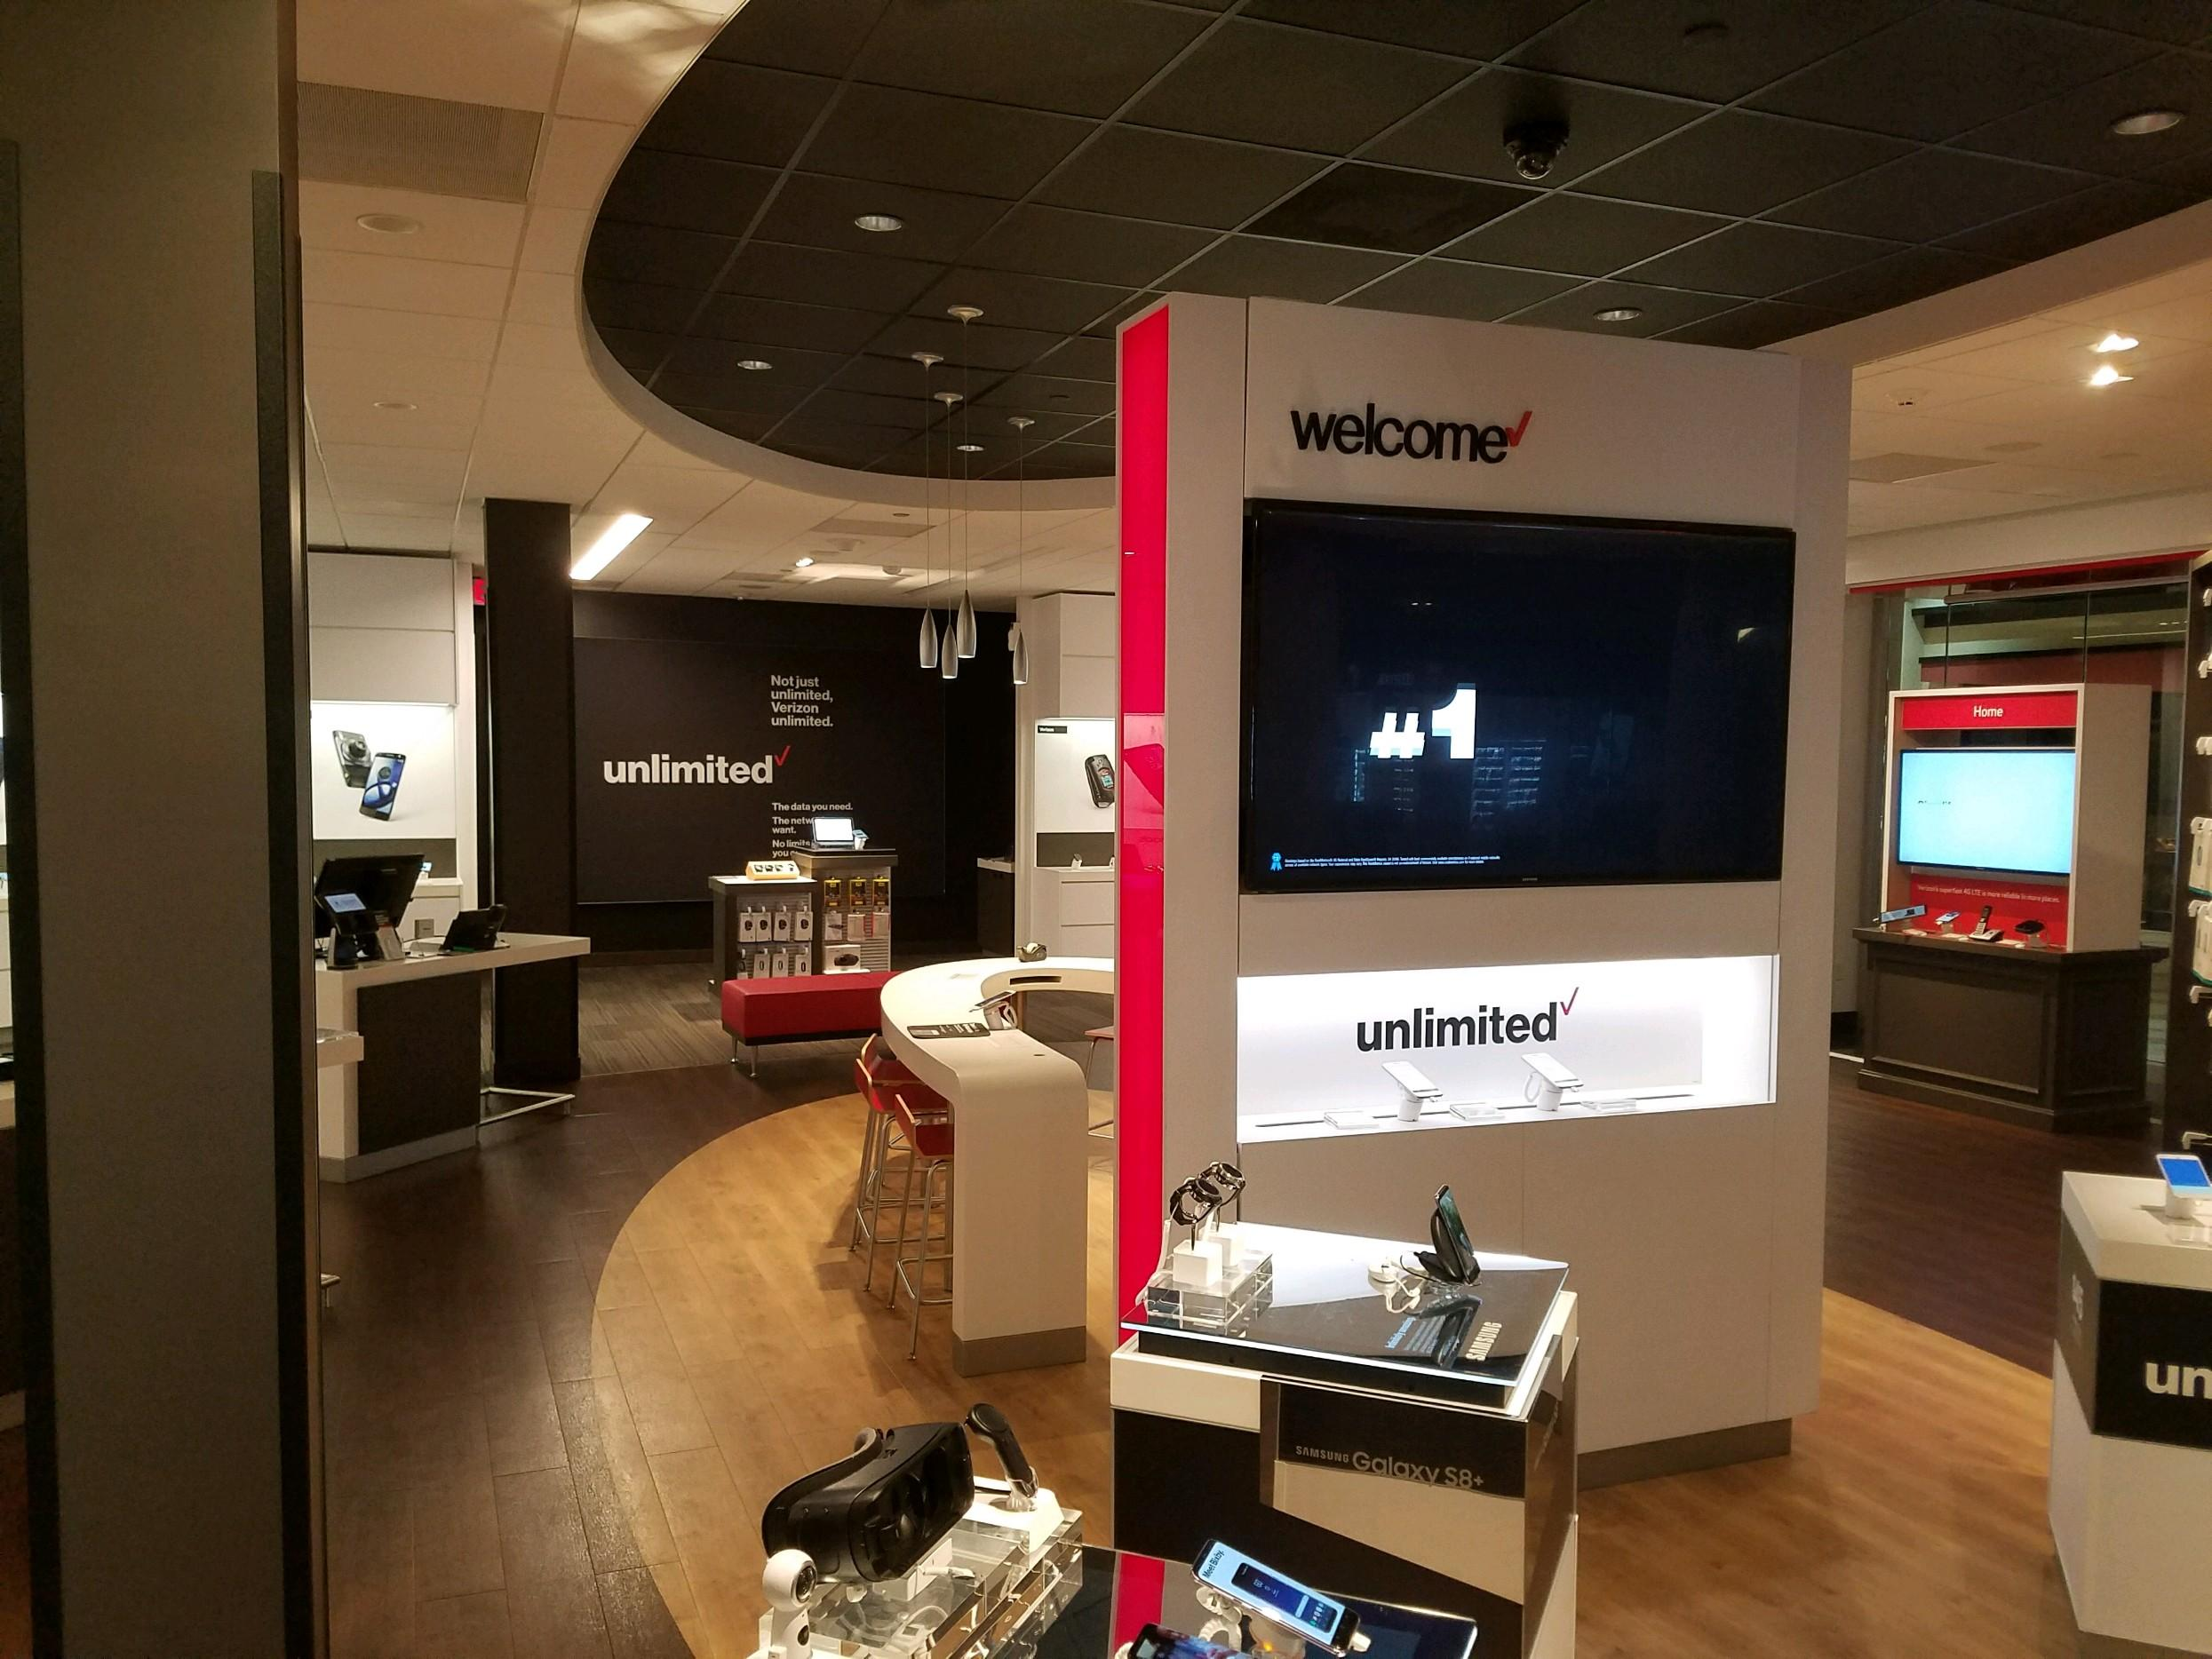 Verizon crossgates mall albany ny / Universal water resistant